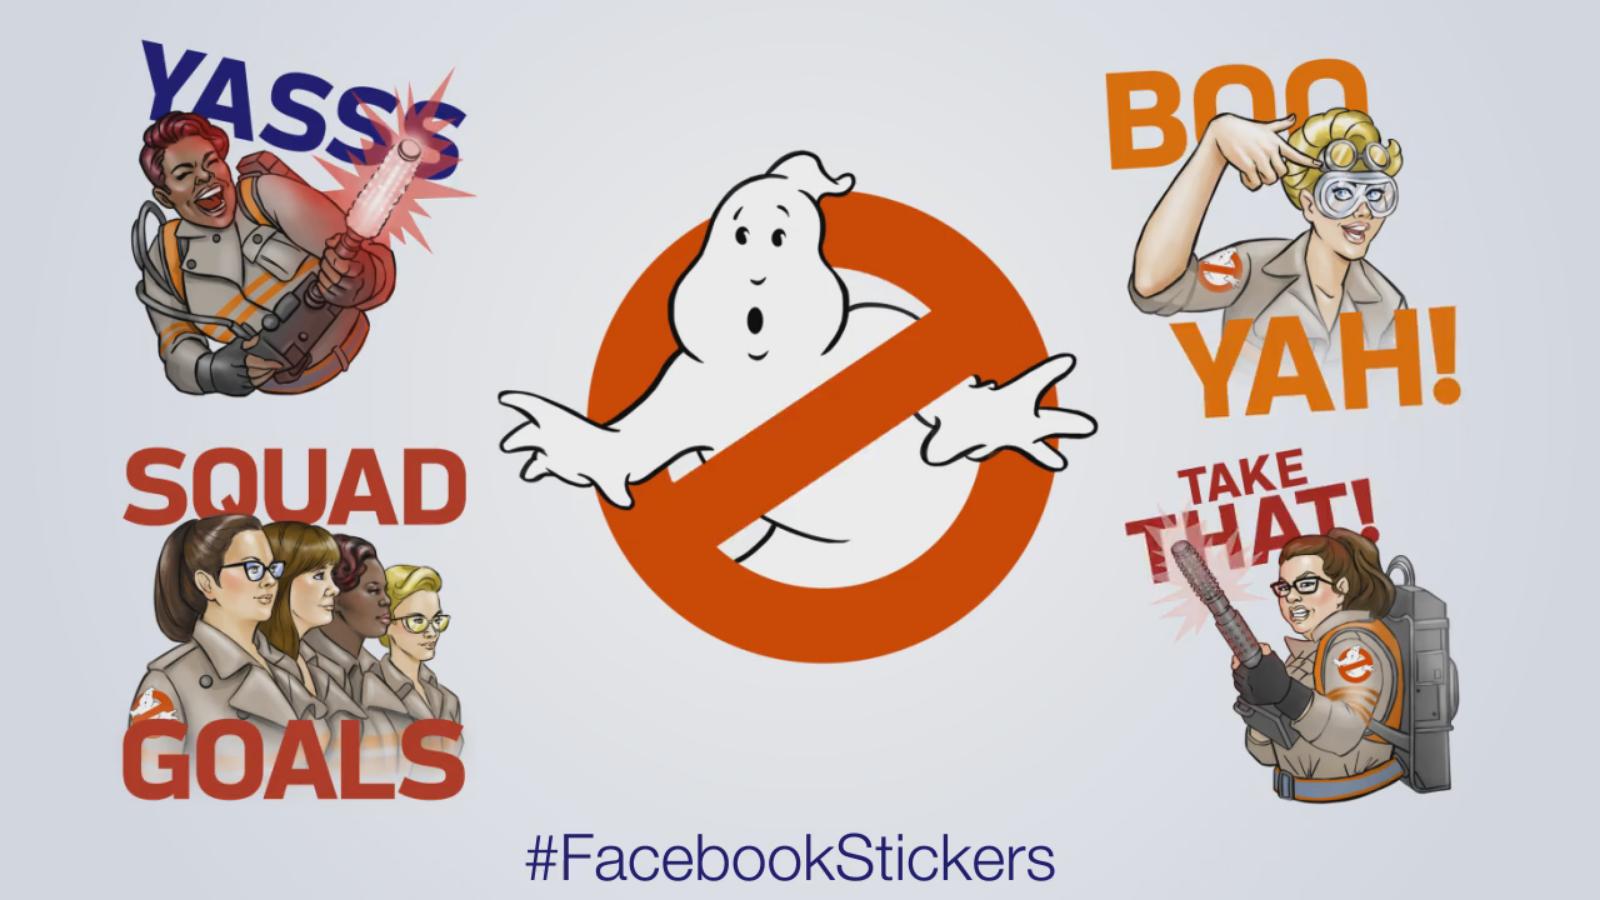 ghostbusters facebook stickers ghostbusters wiki fandom powered